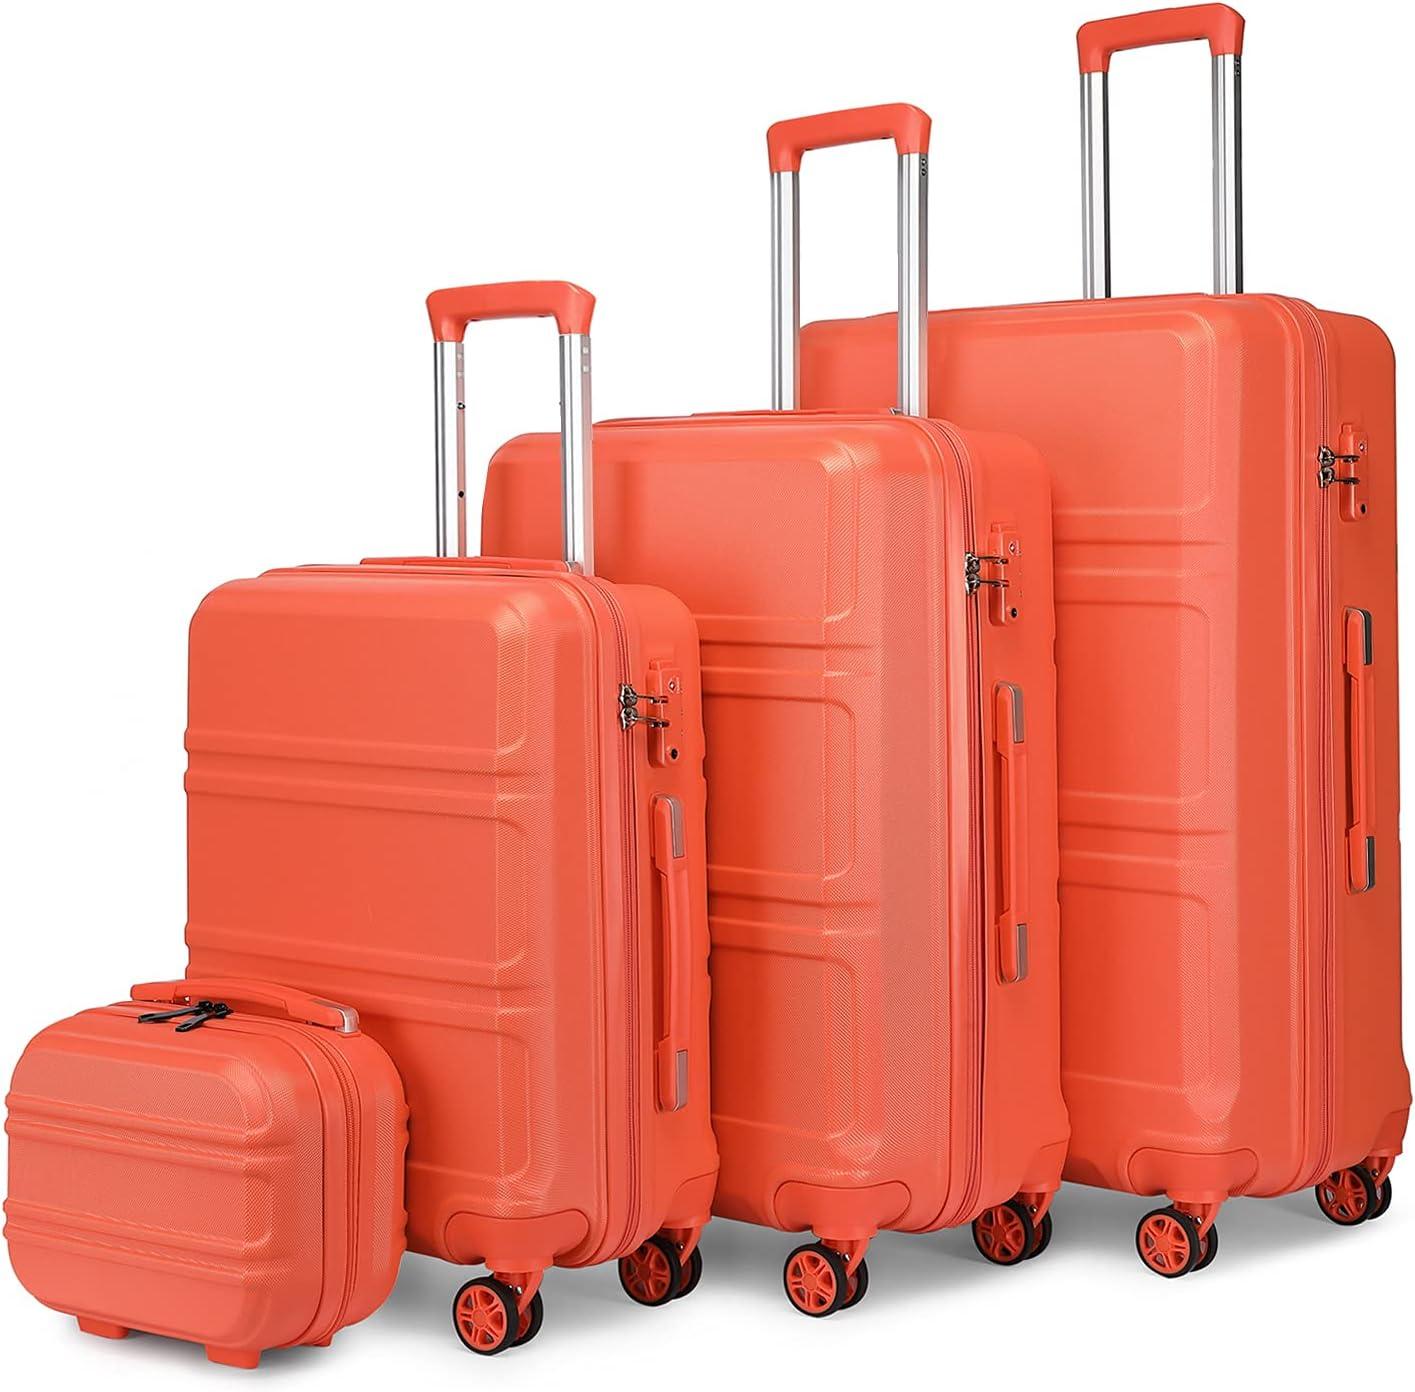 Kono valigie rigide miglior set di valigie da 4 pezzi